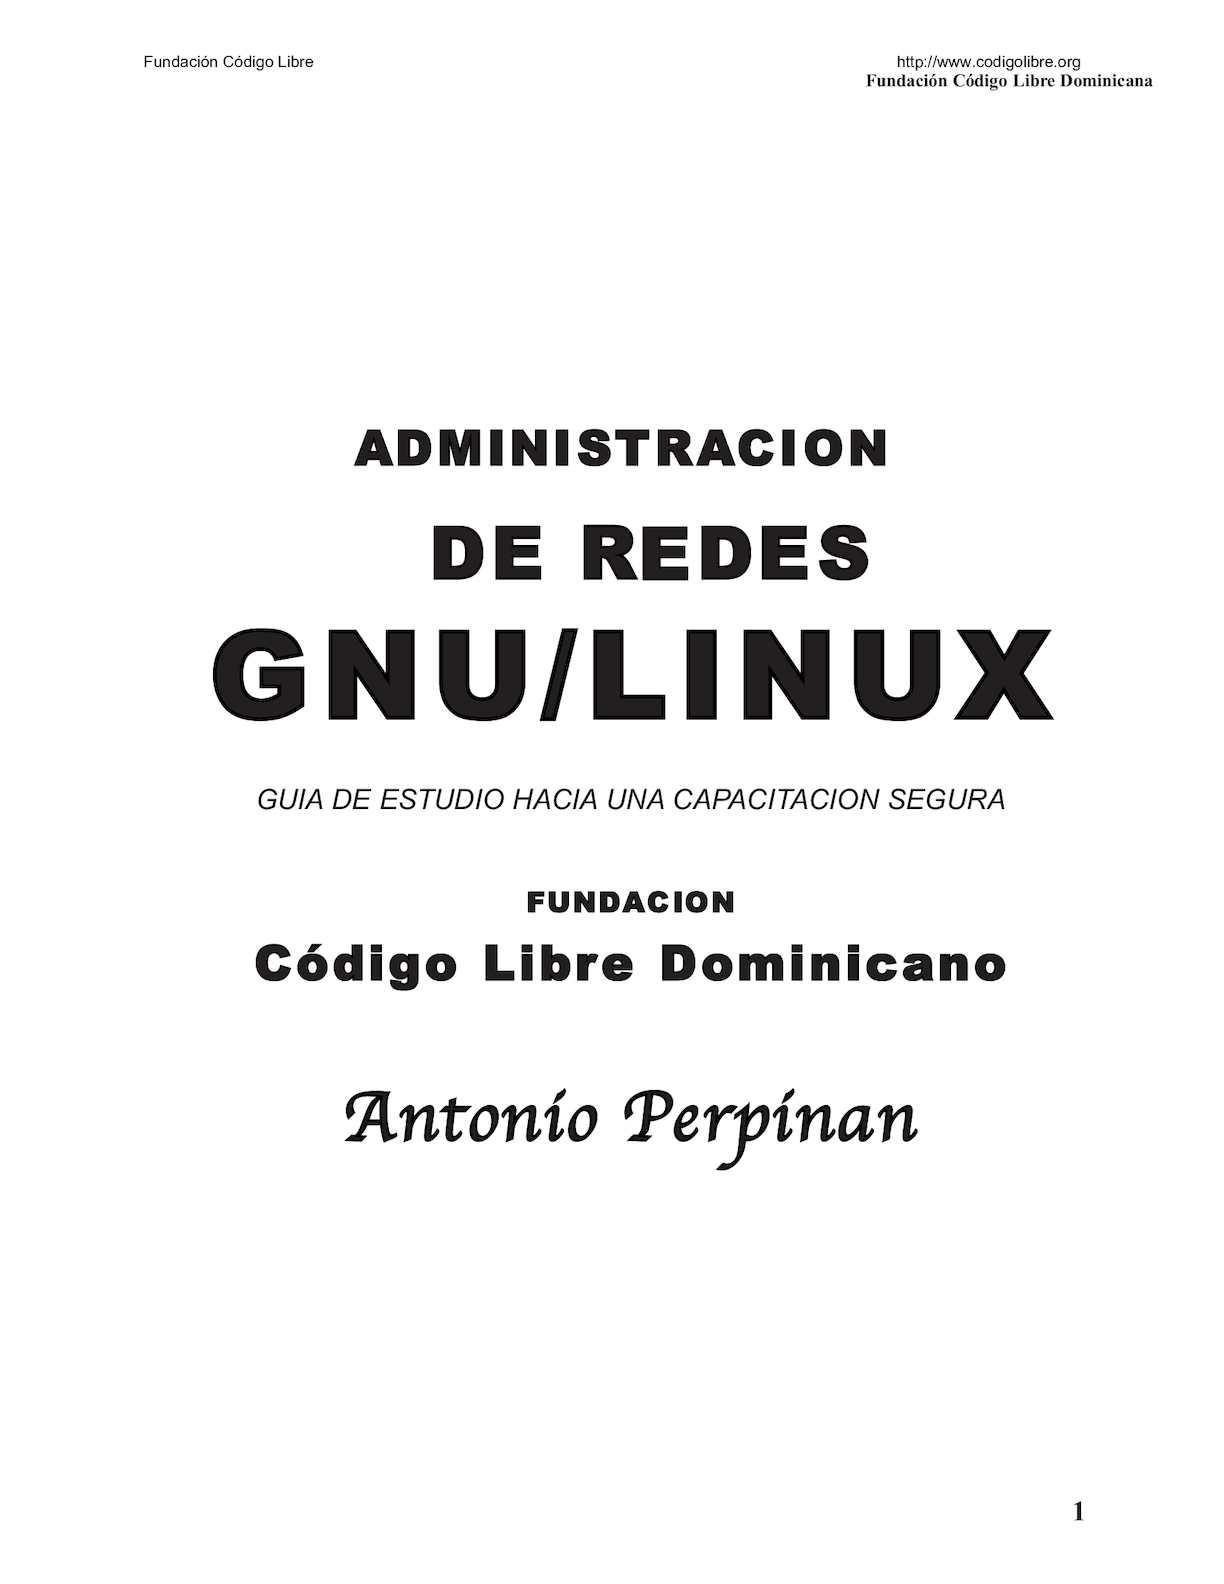 Calaméo - 3182294 Administracion De Redes Gnulinux